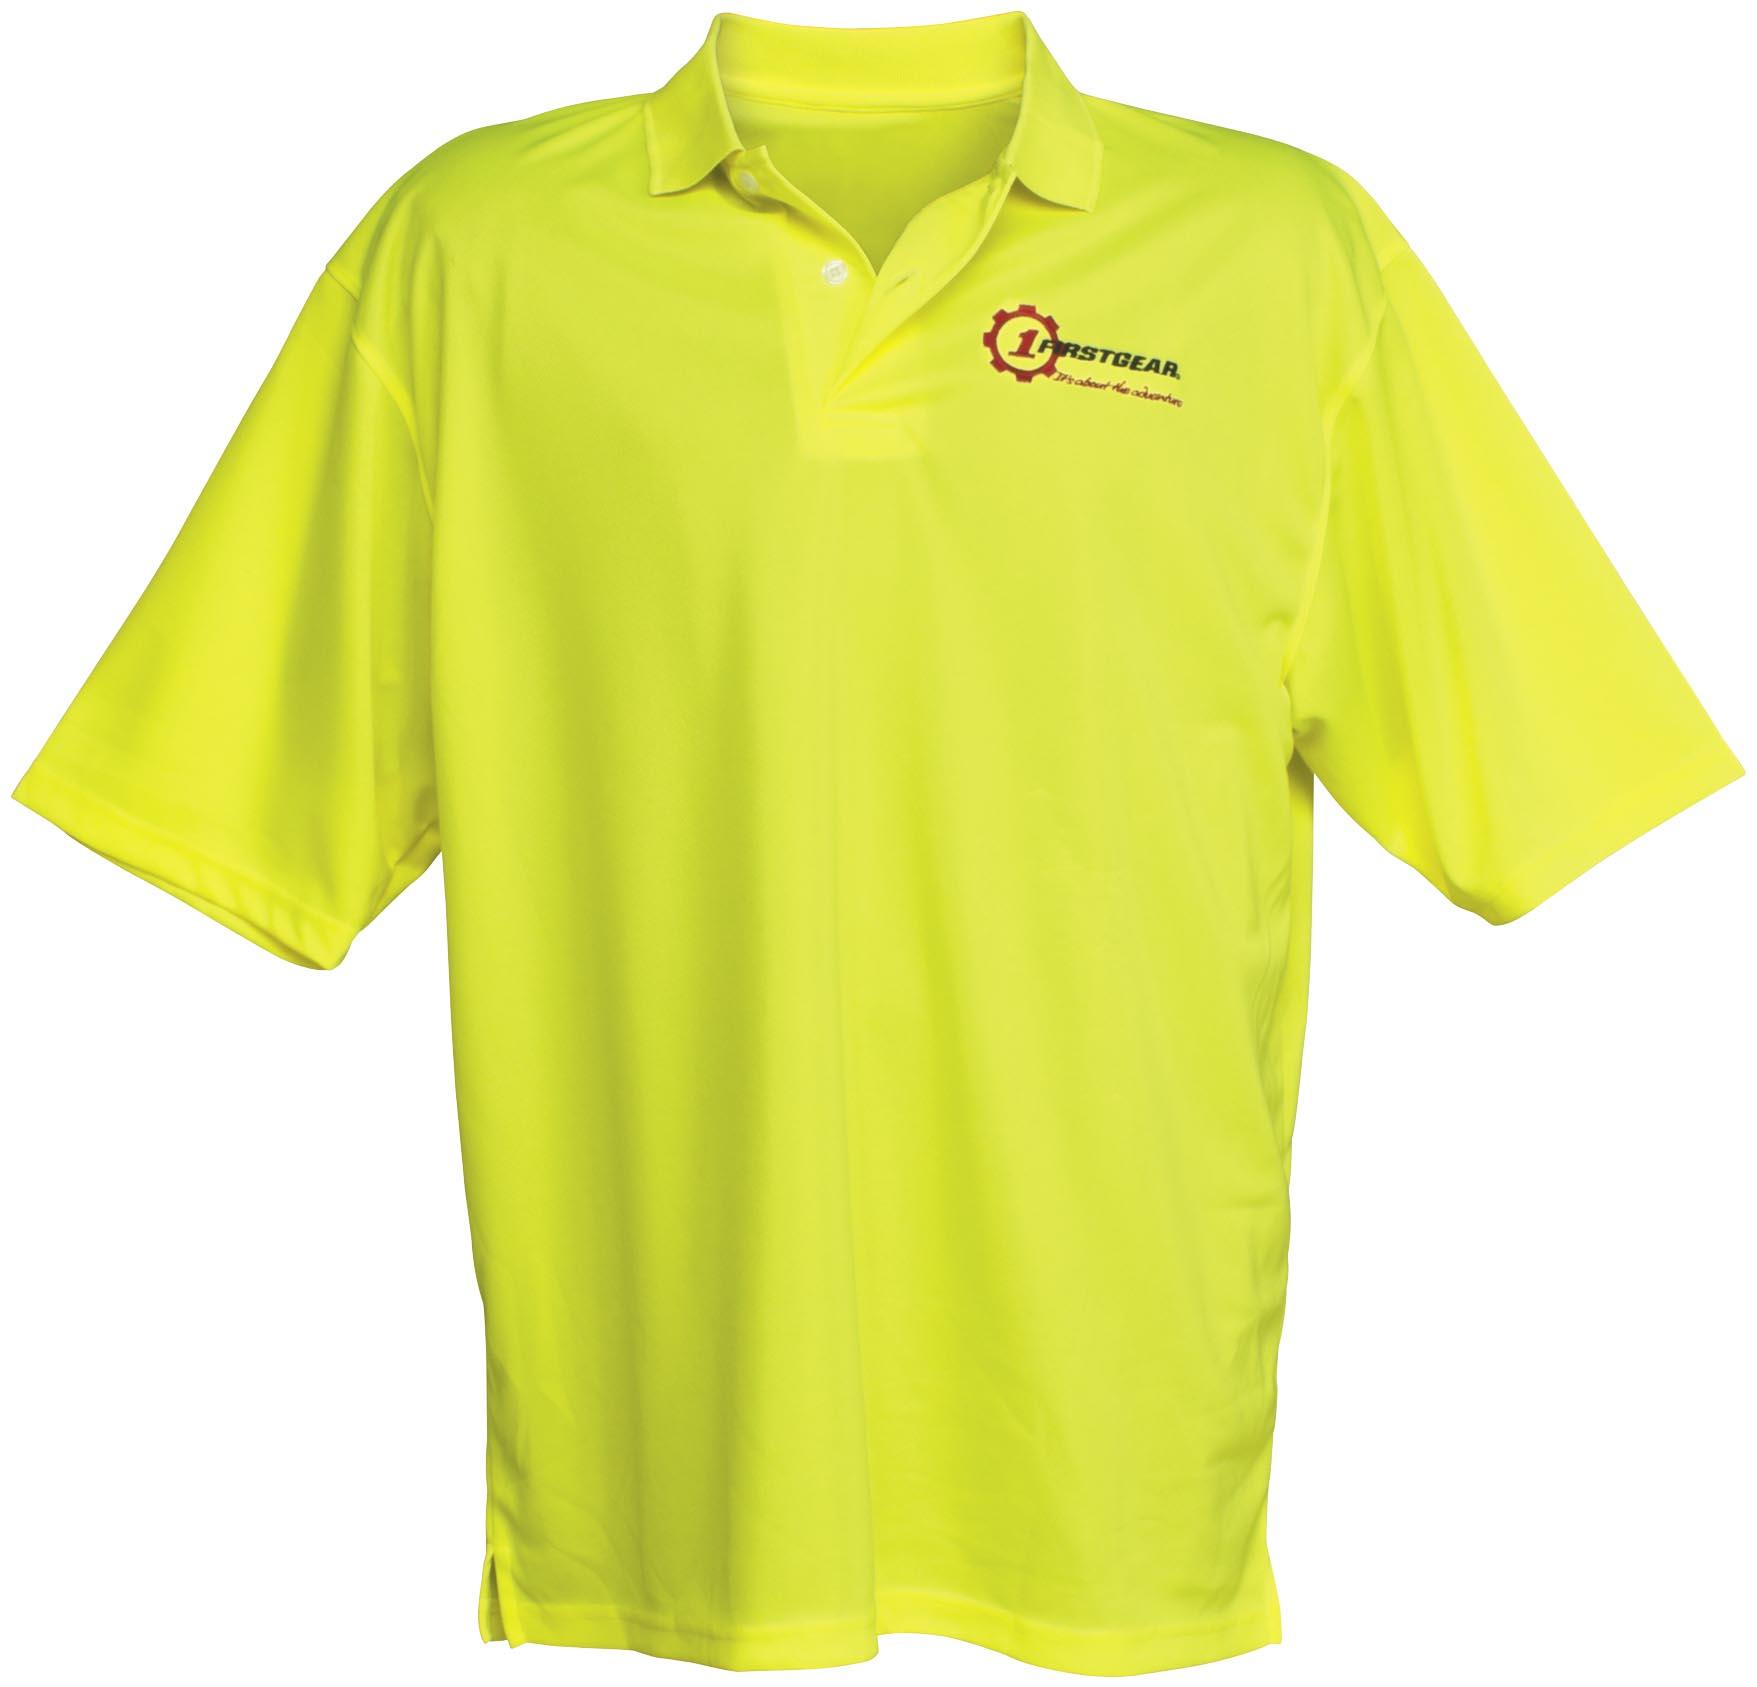 Firstgear Polo Shirt